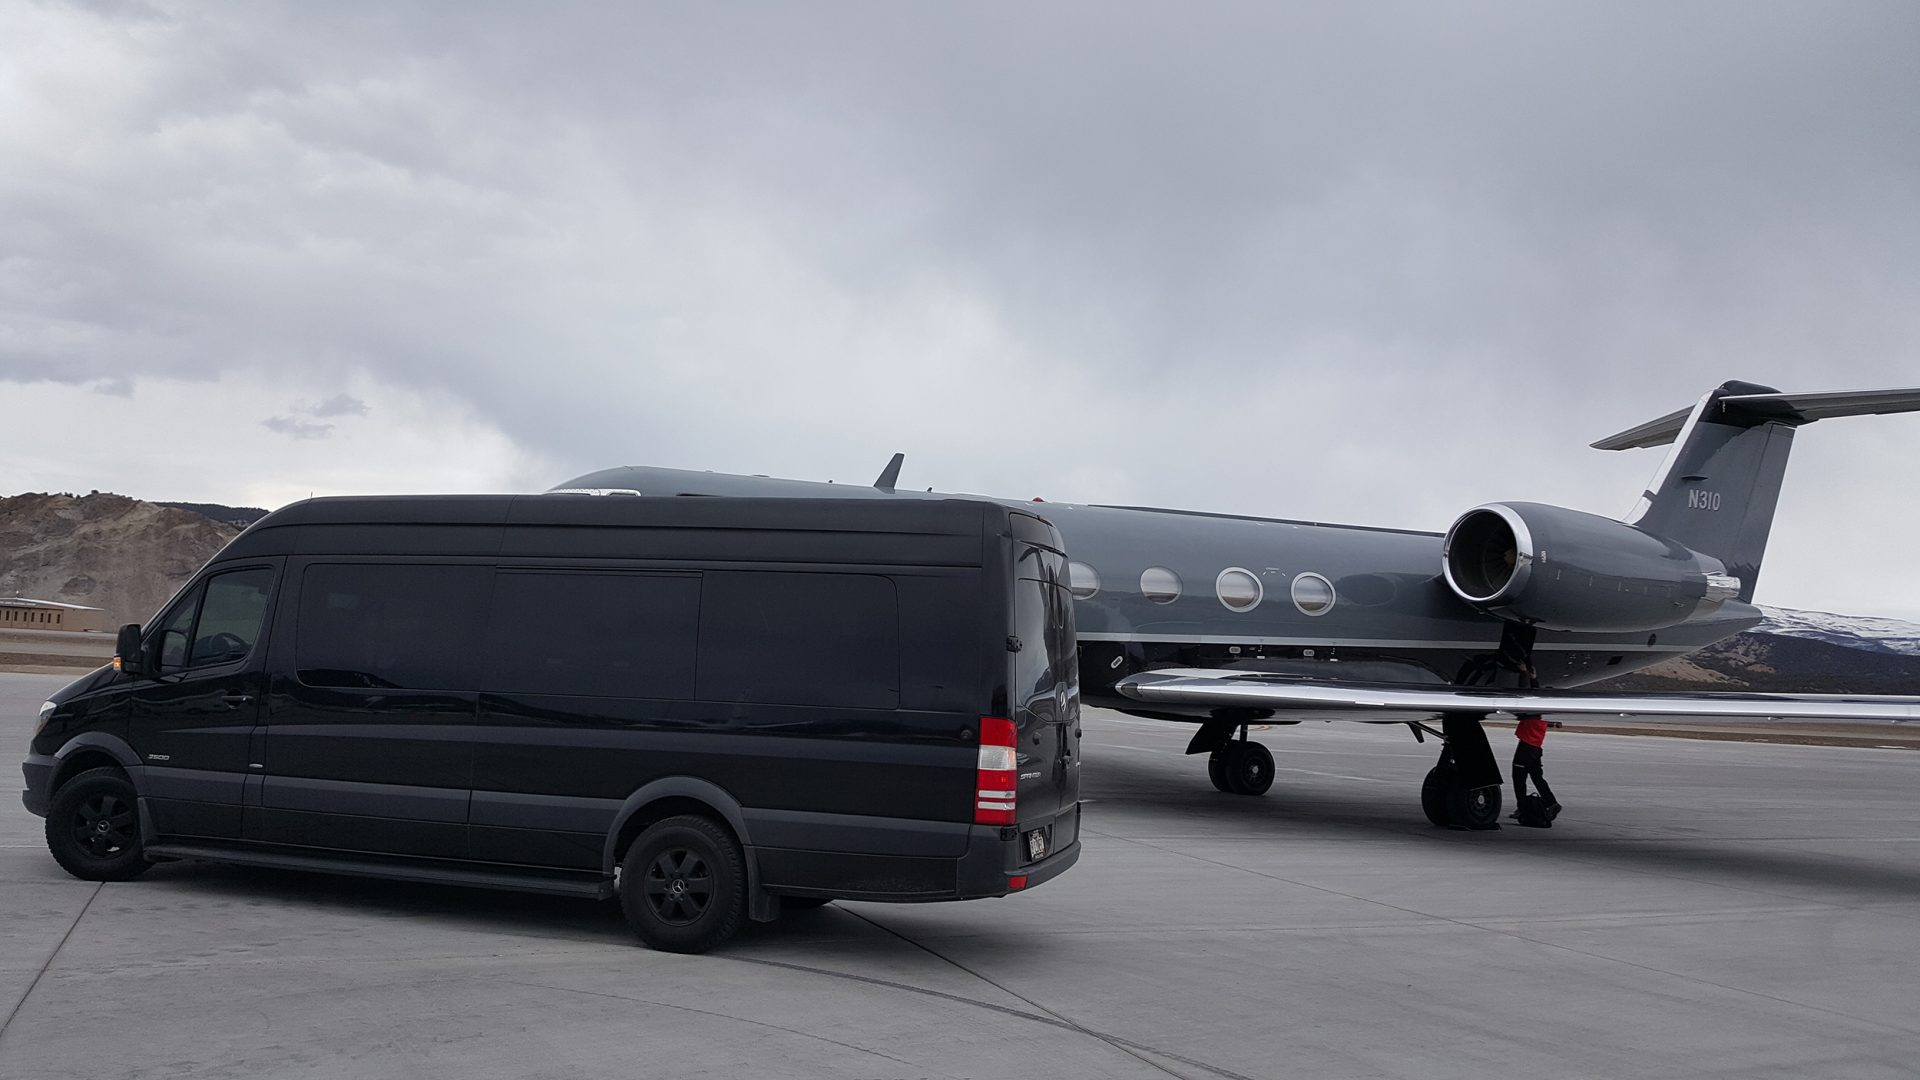 fbo private jet chauffeur